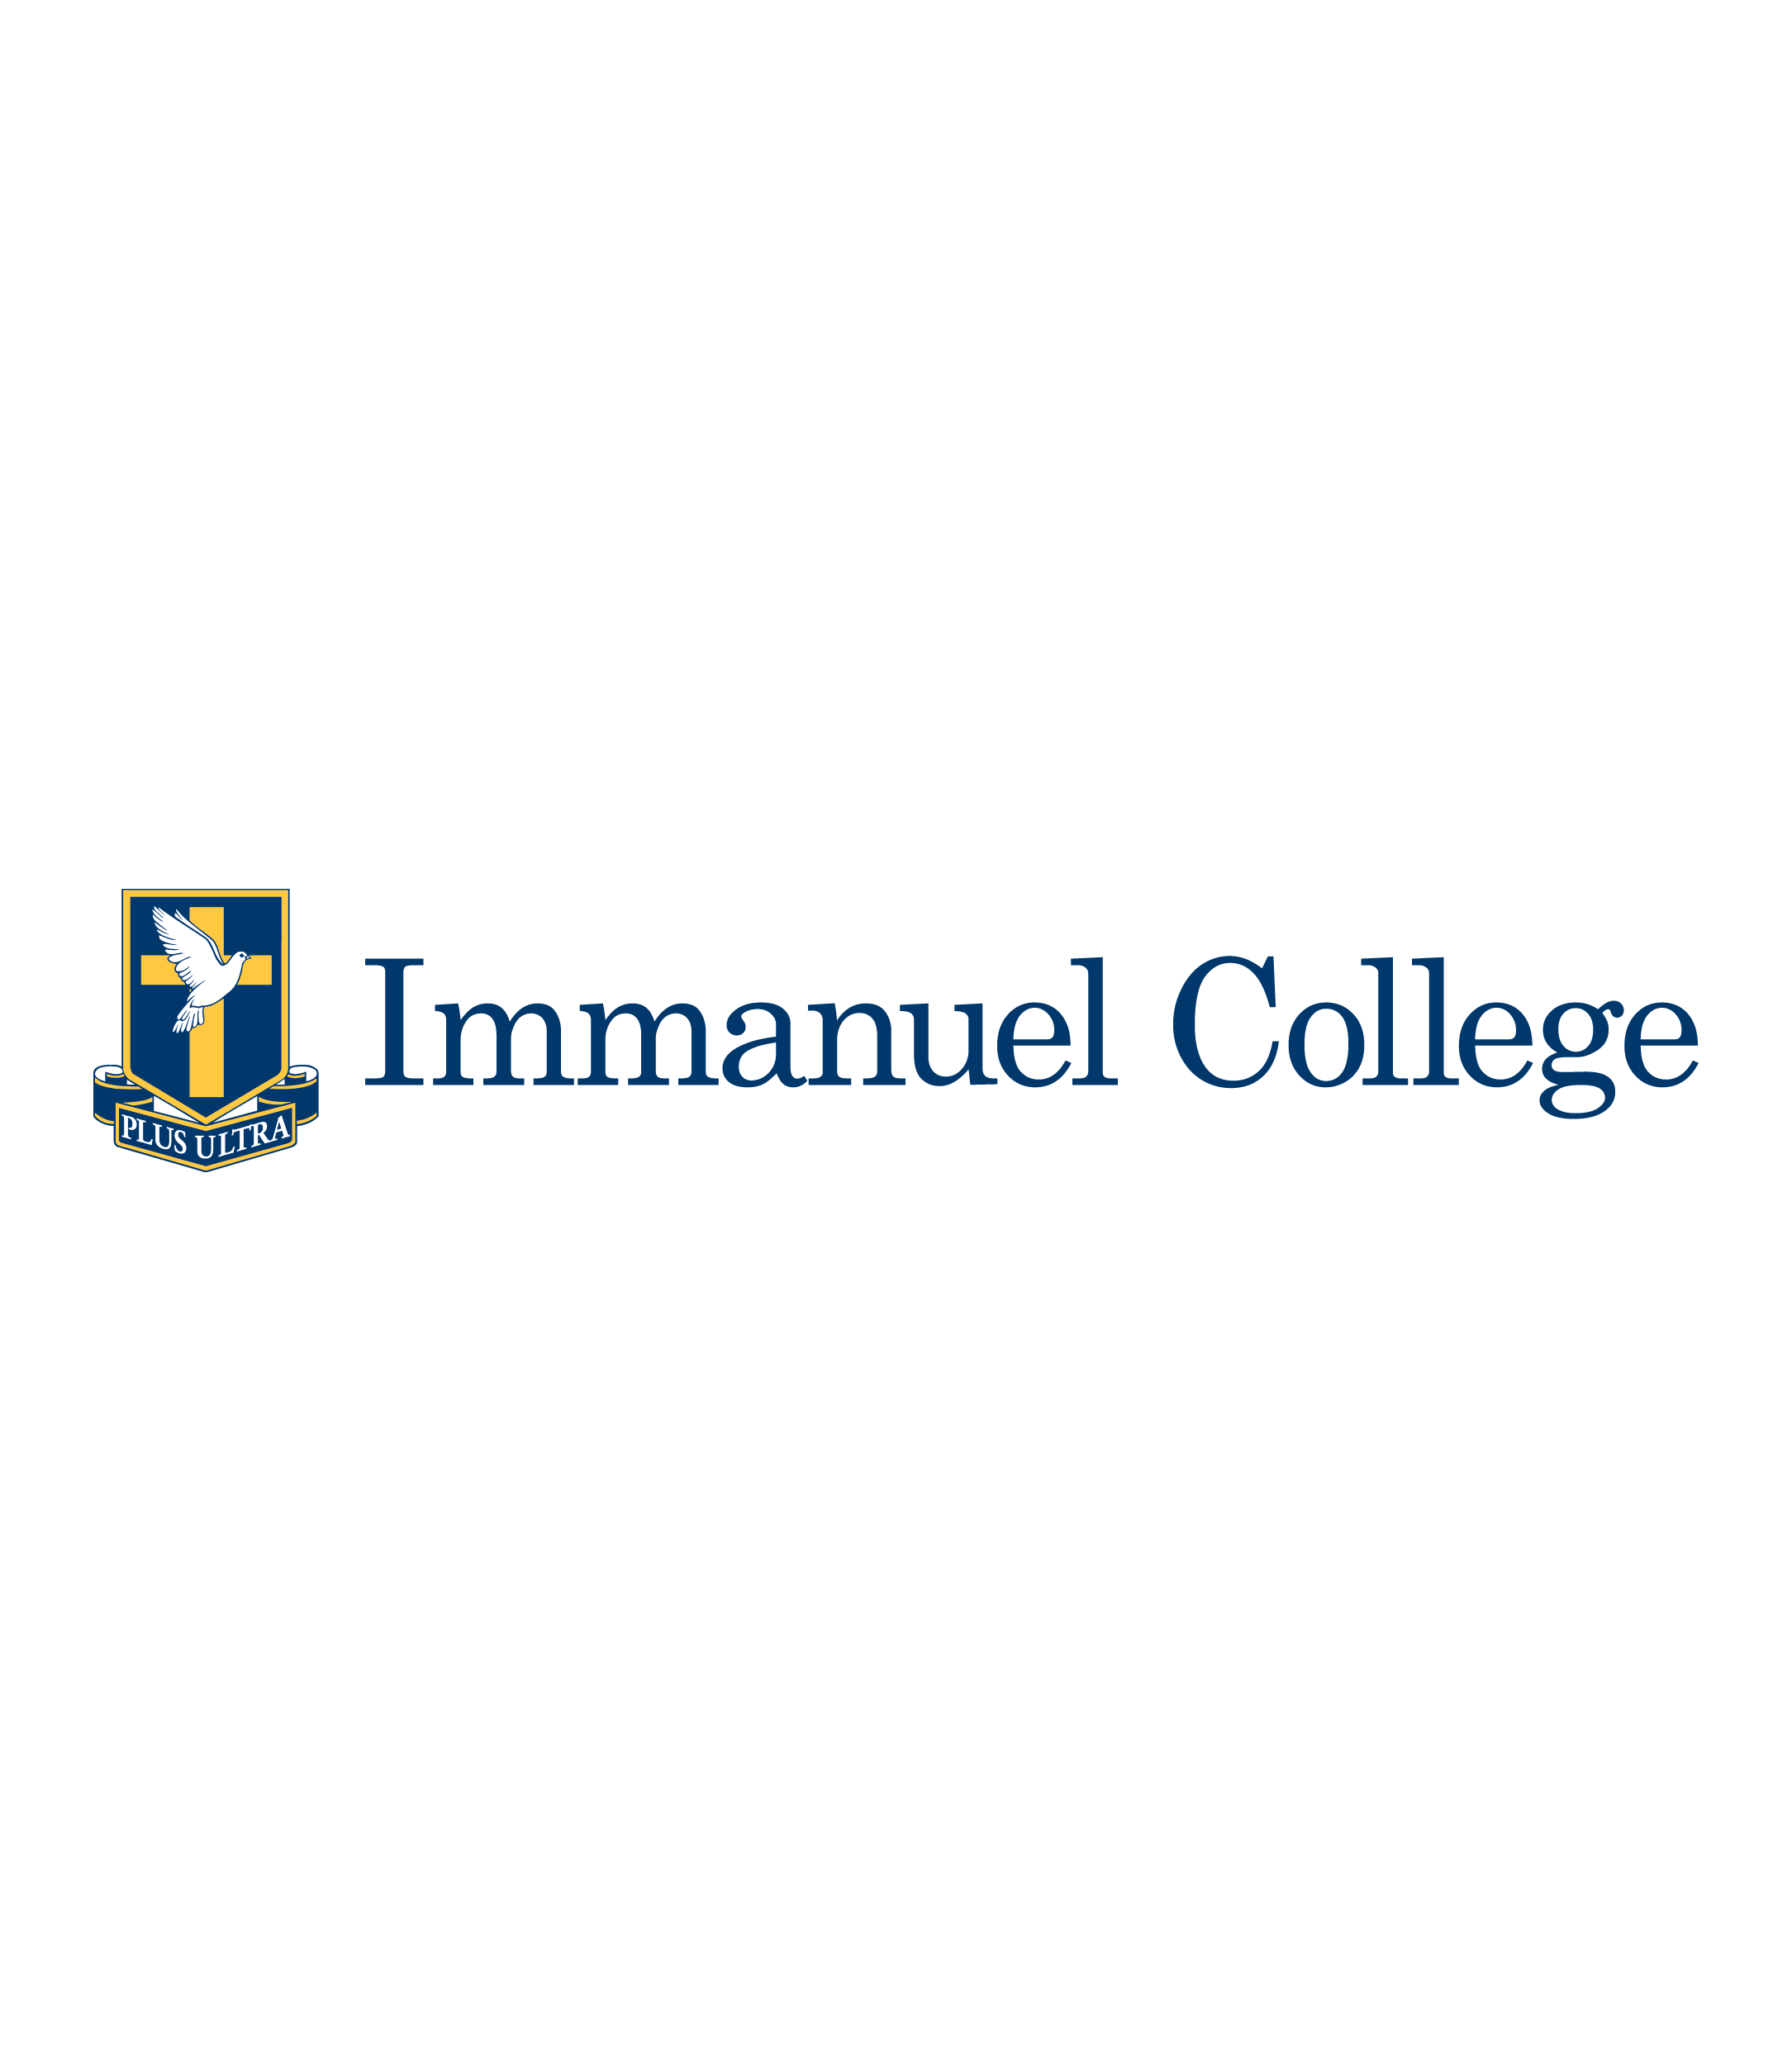 Immanuel College, Novar Gardens, SA